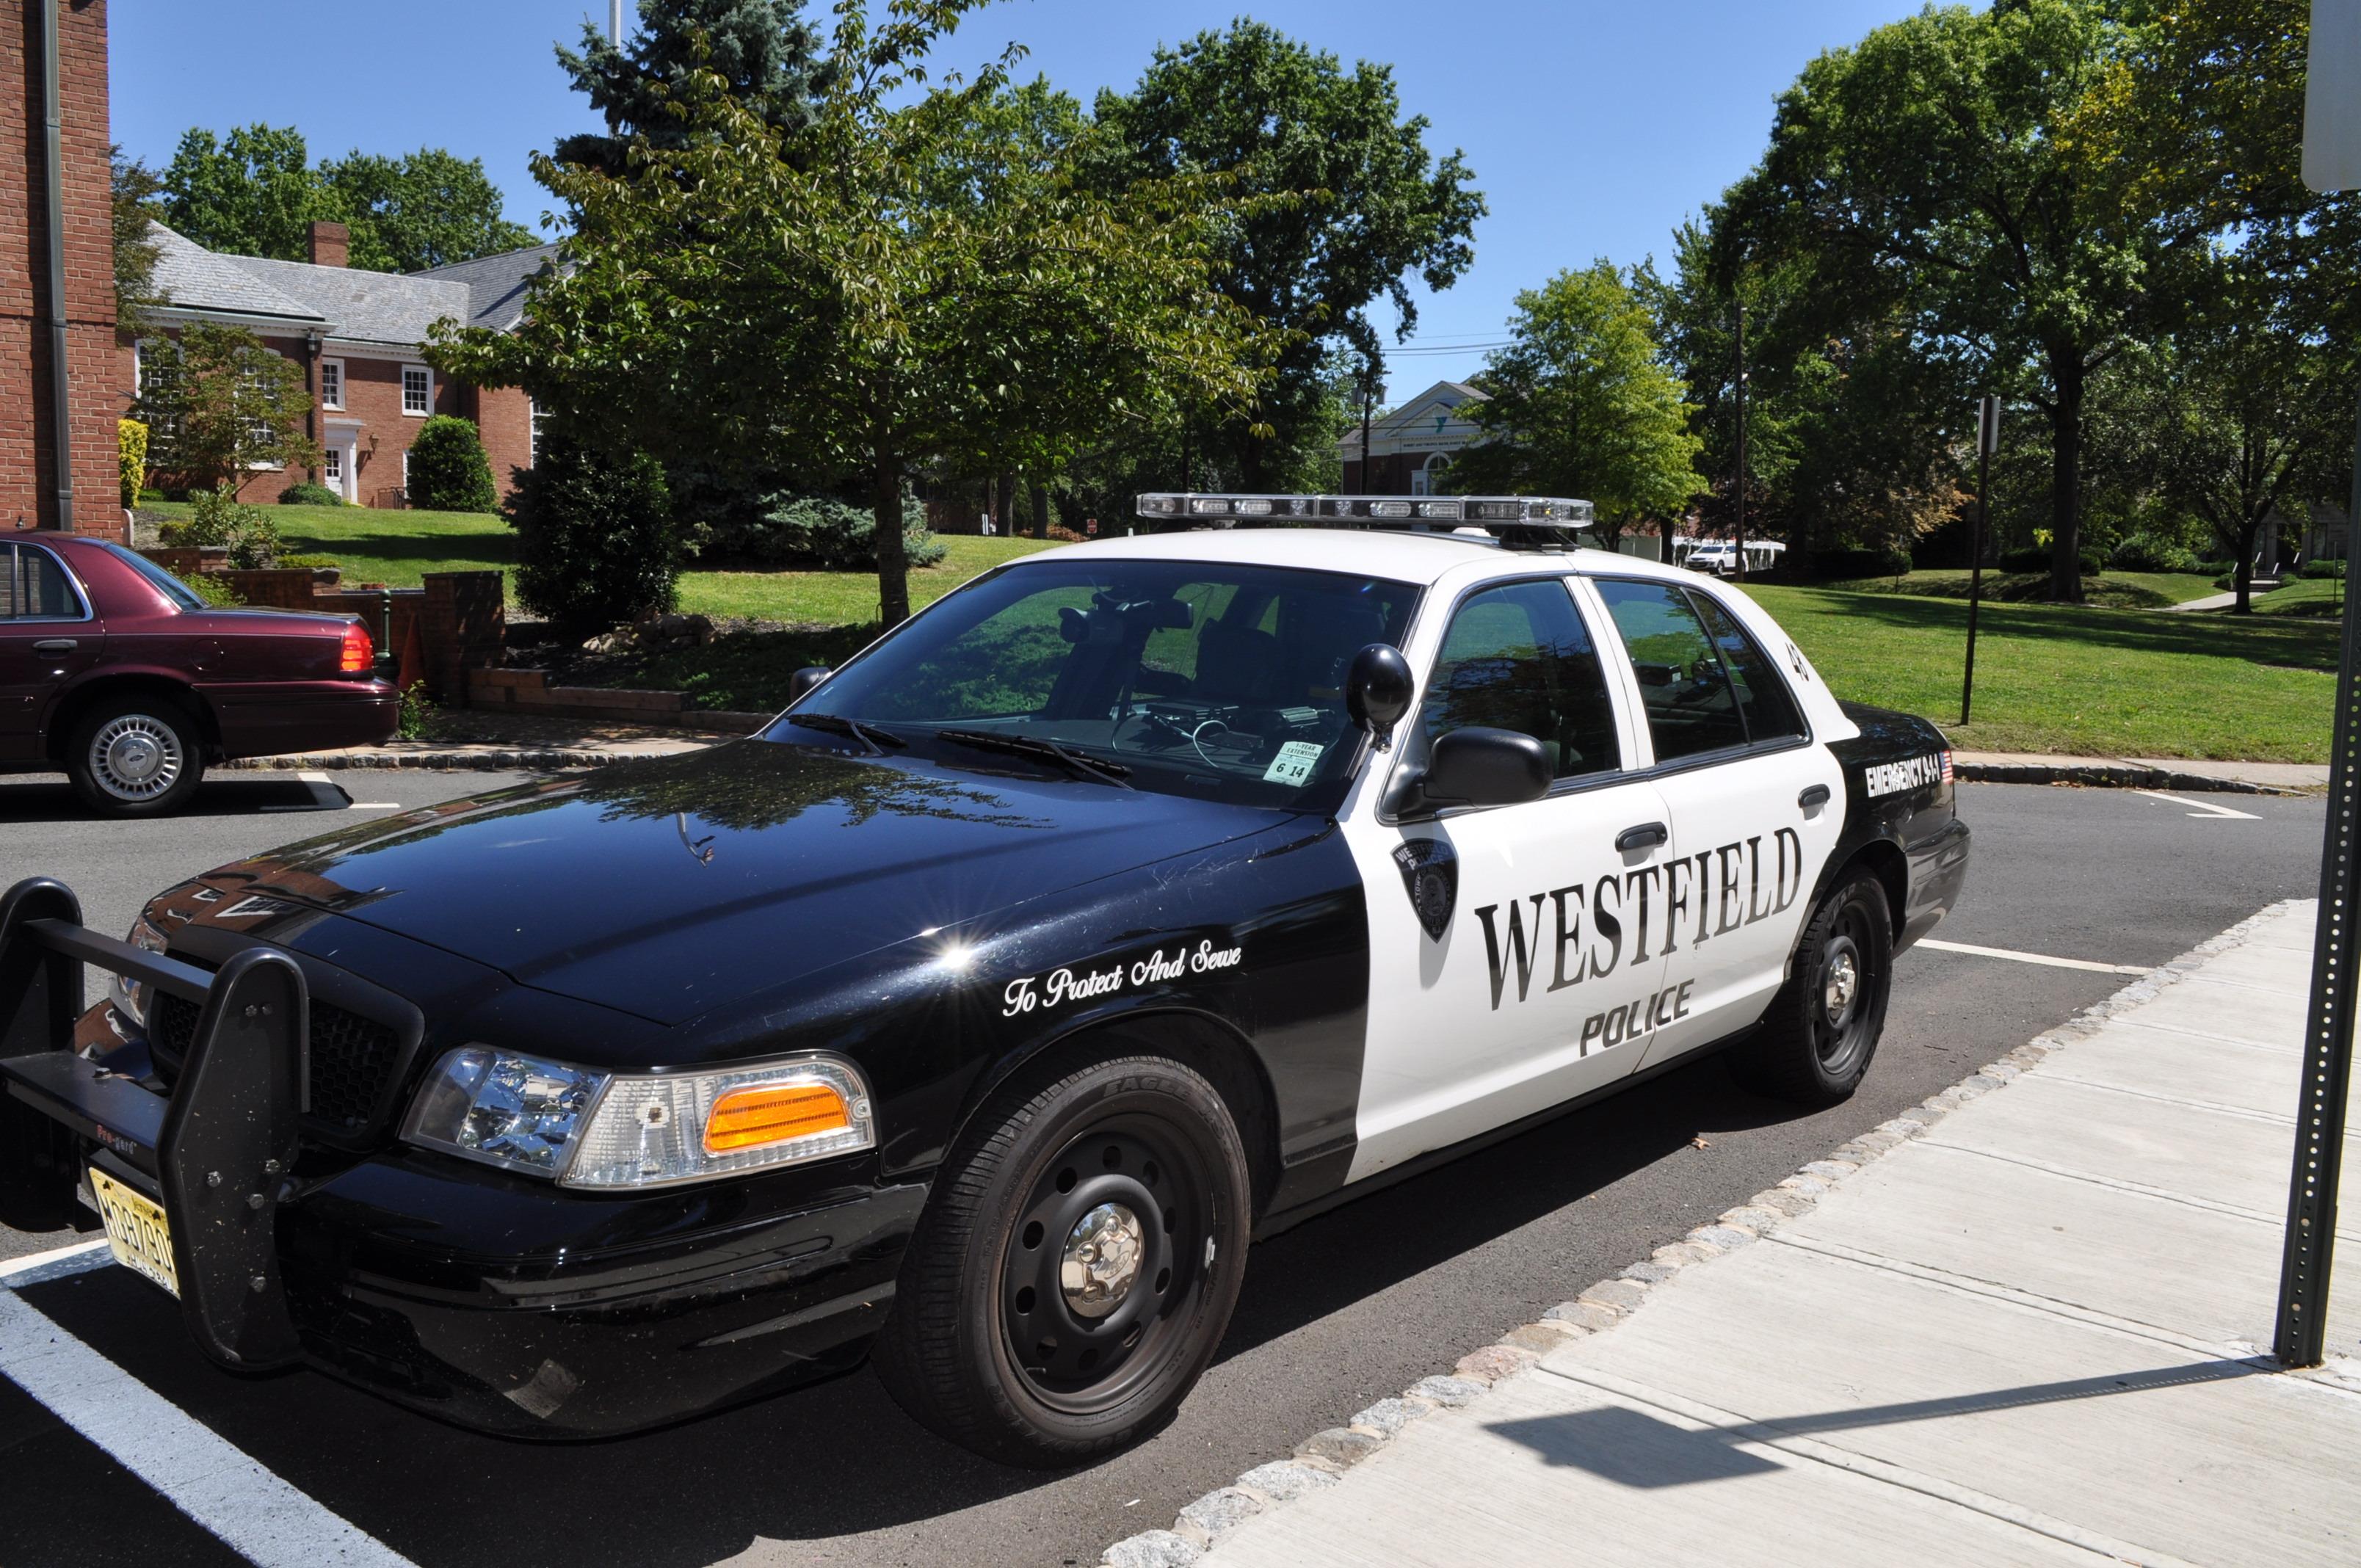 9237ecff42c959bbbe6a_police_car.JPG